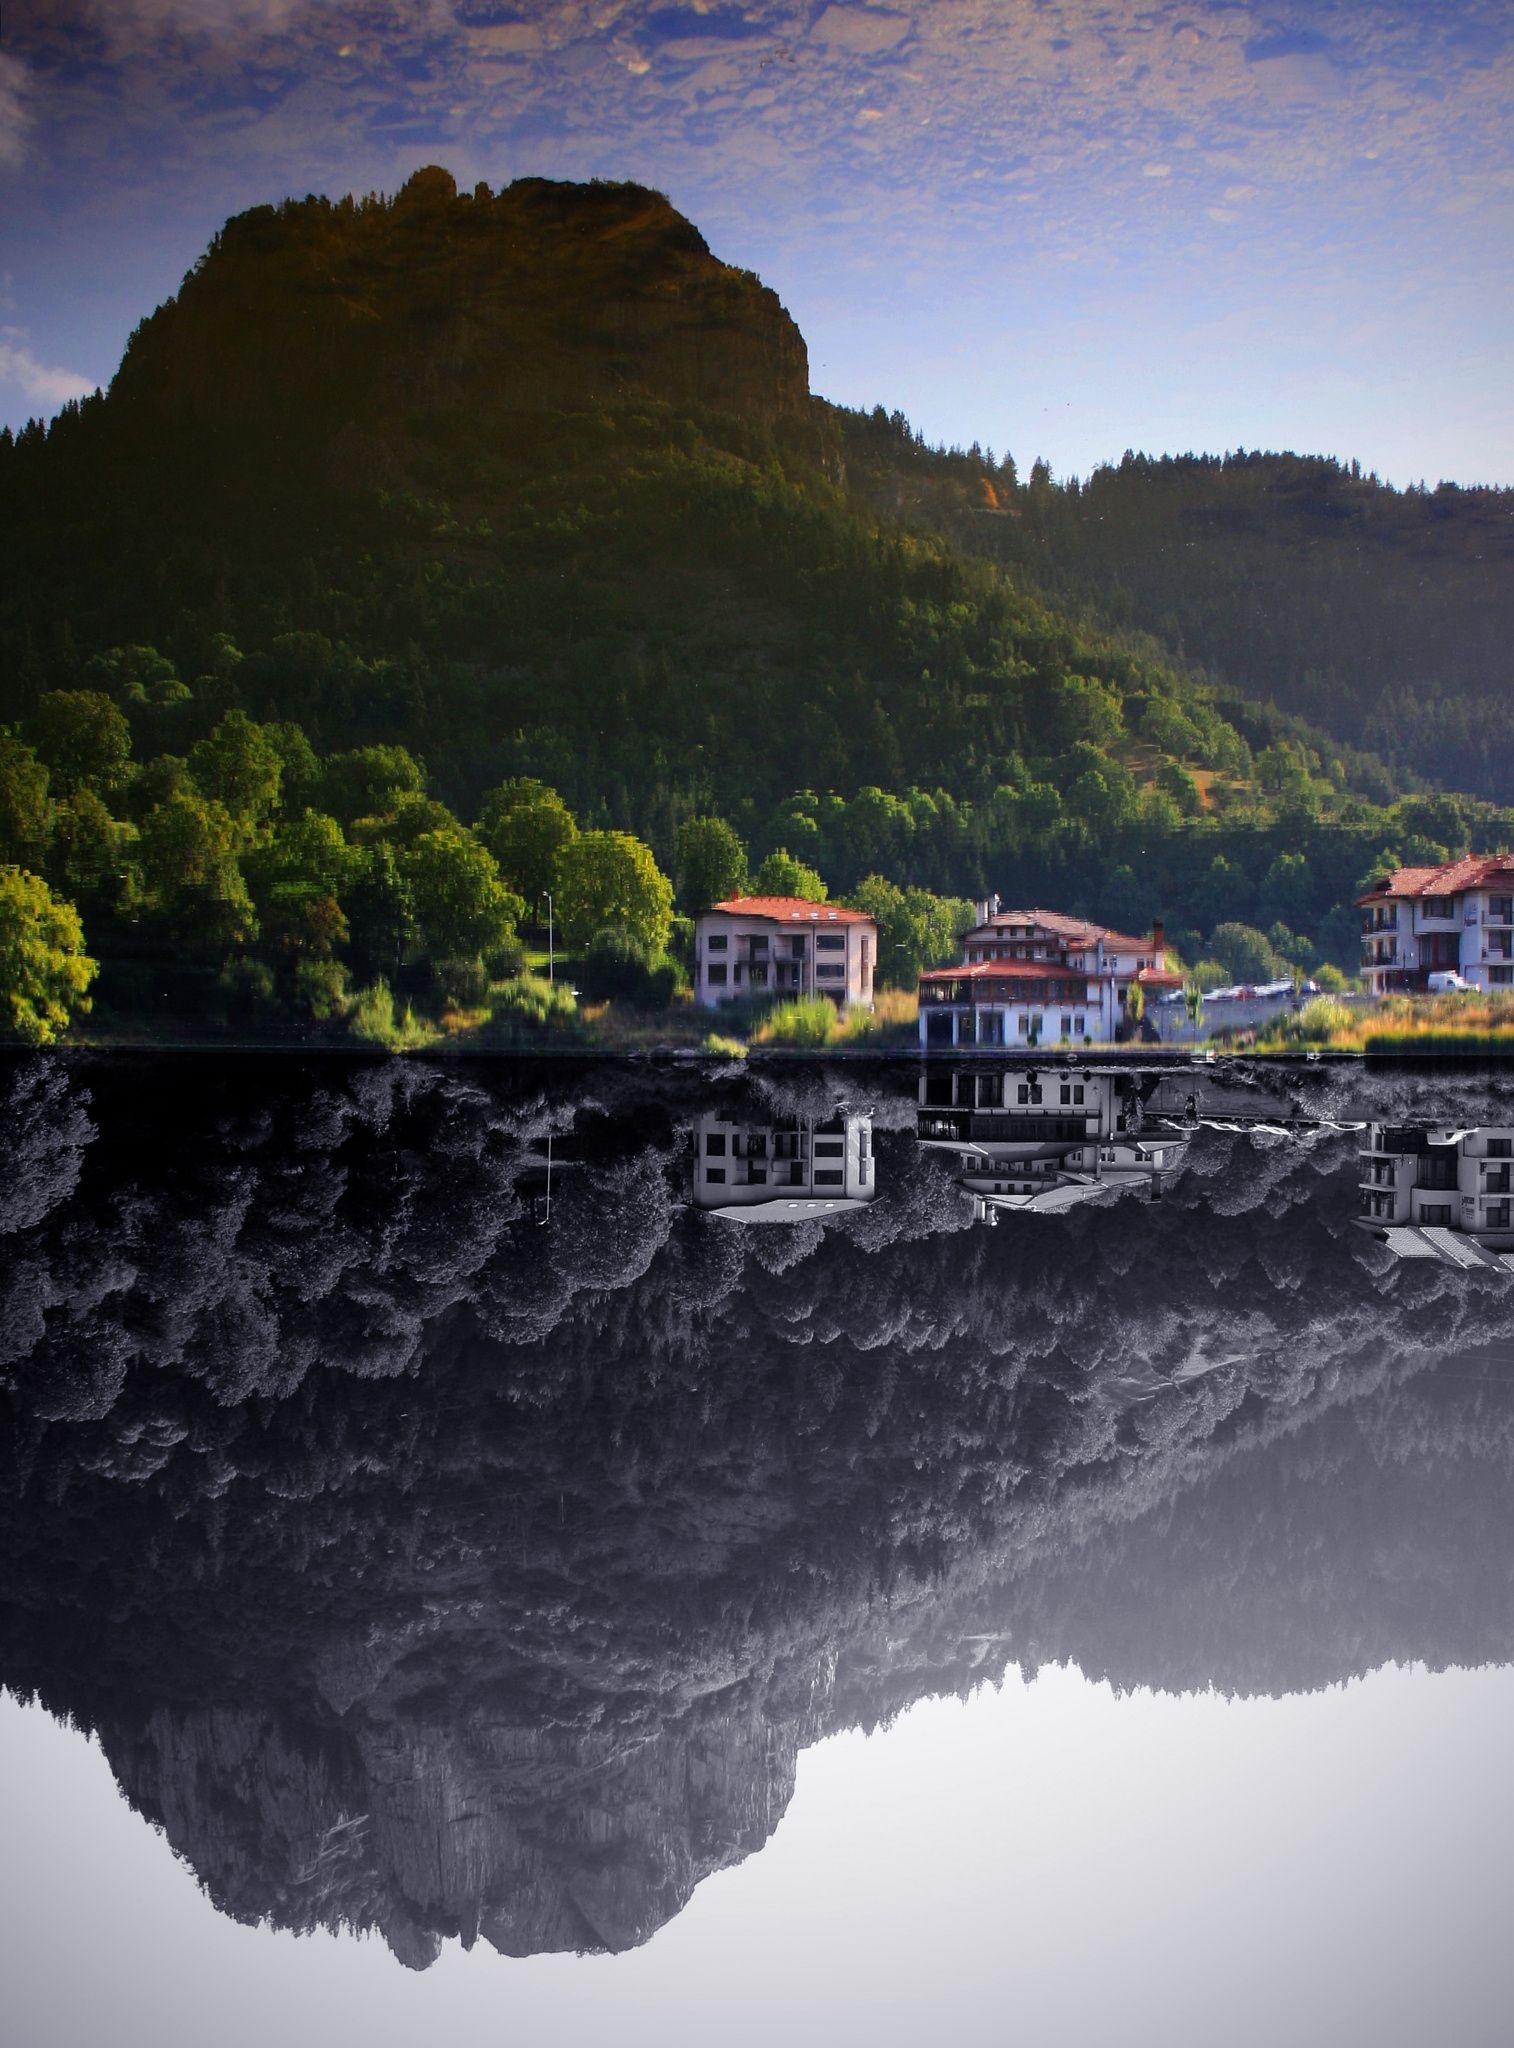 Reflected world - Nature in Smolyan, Bulgaria.